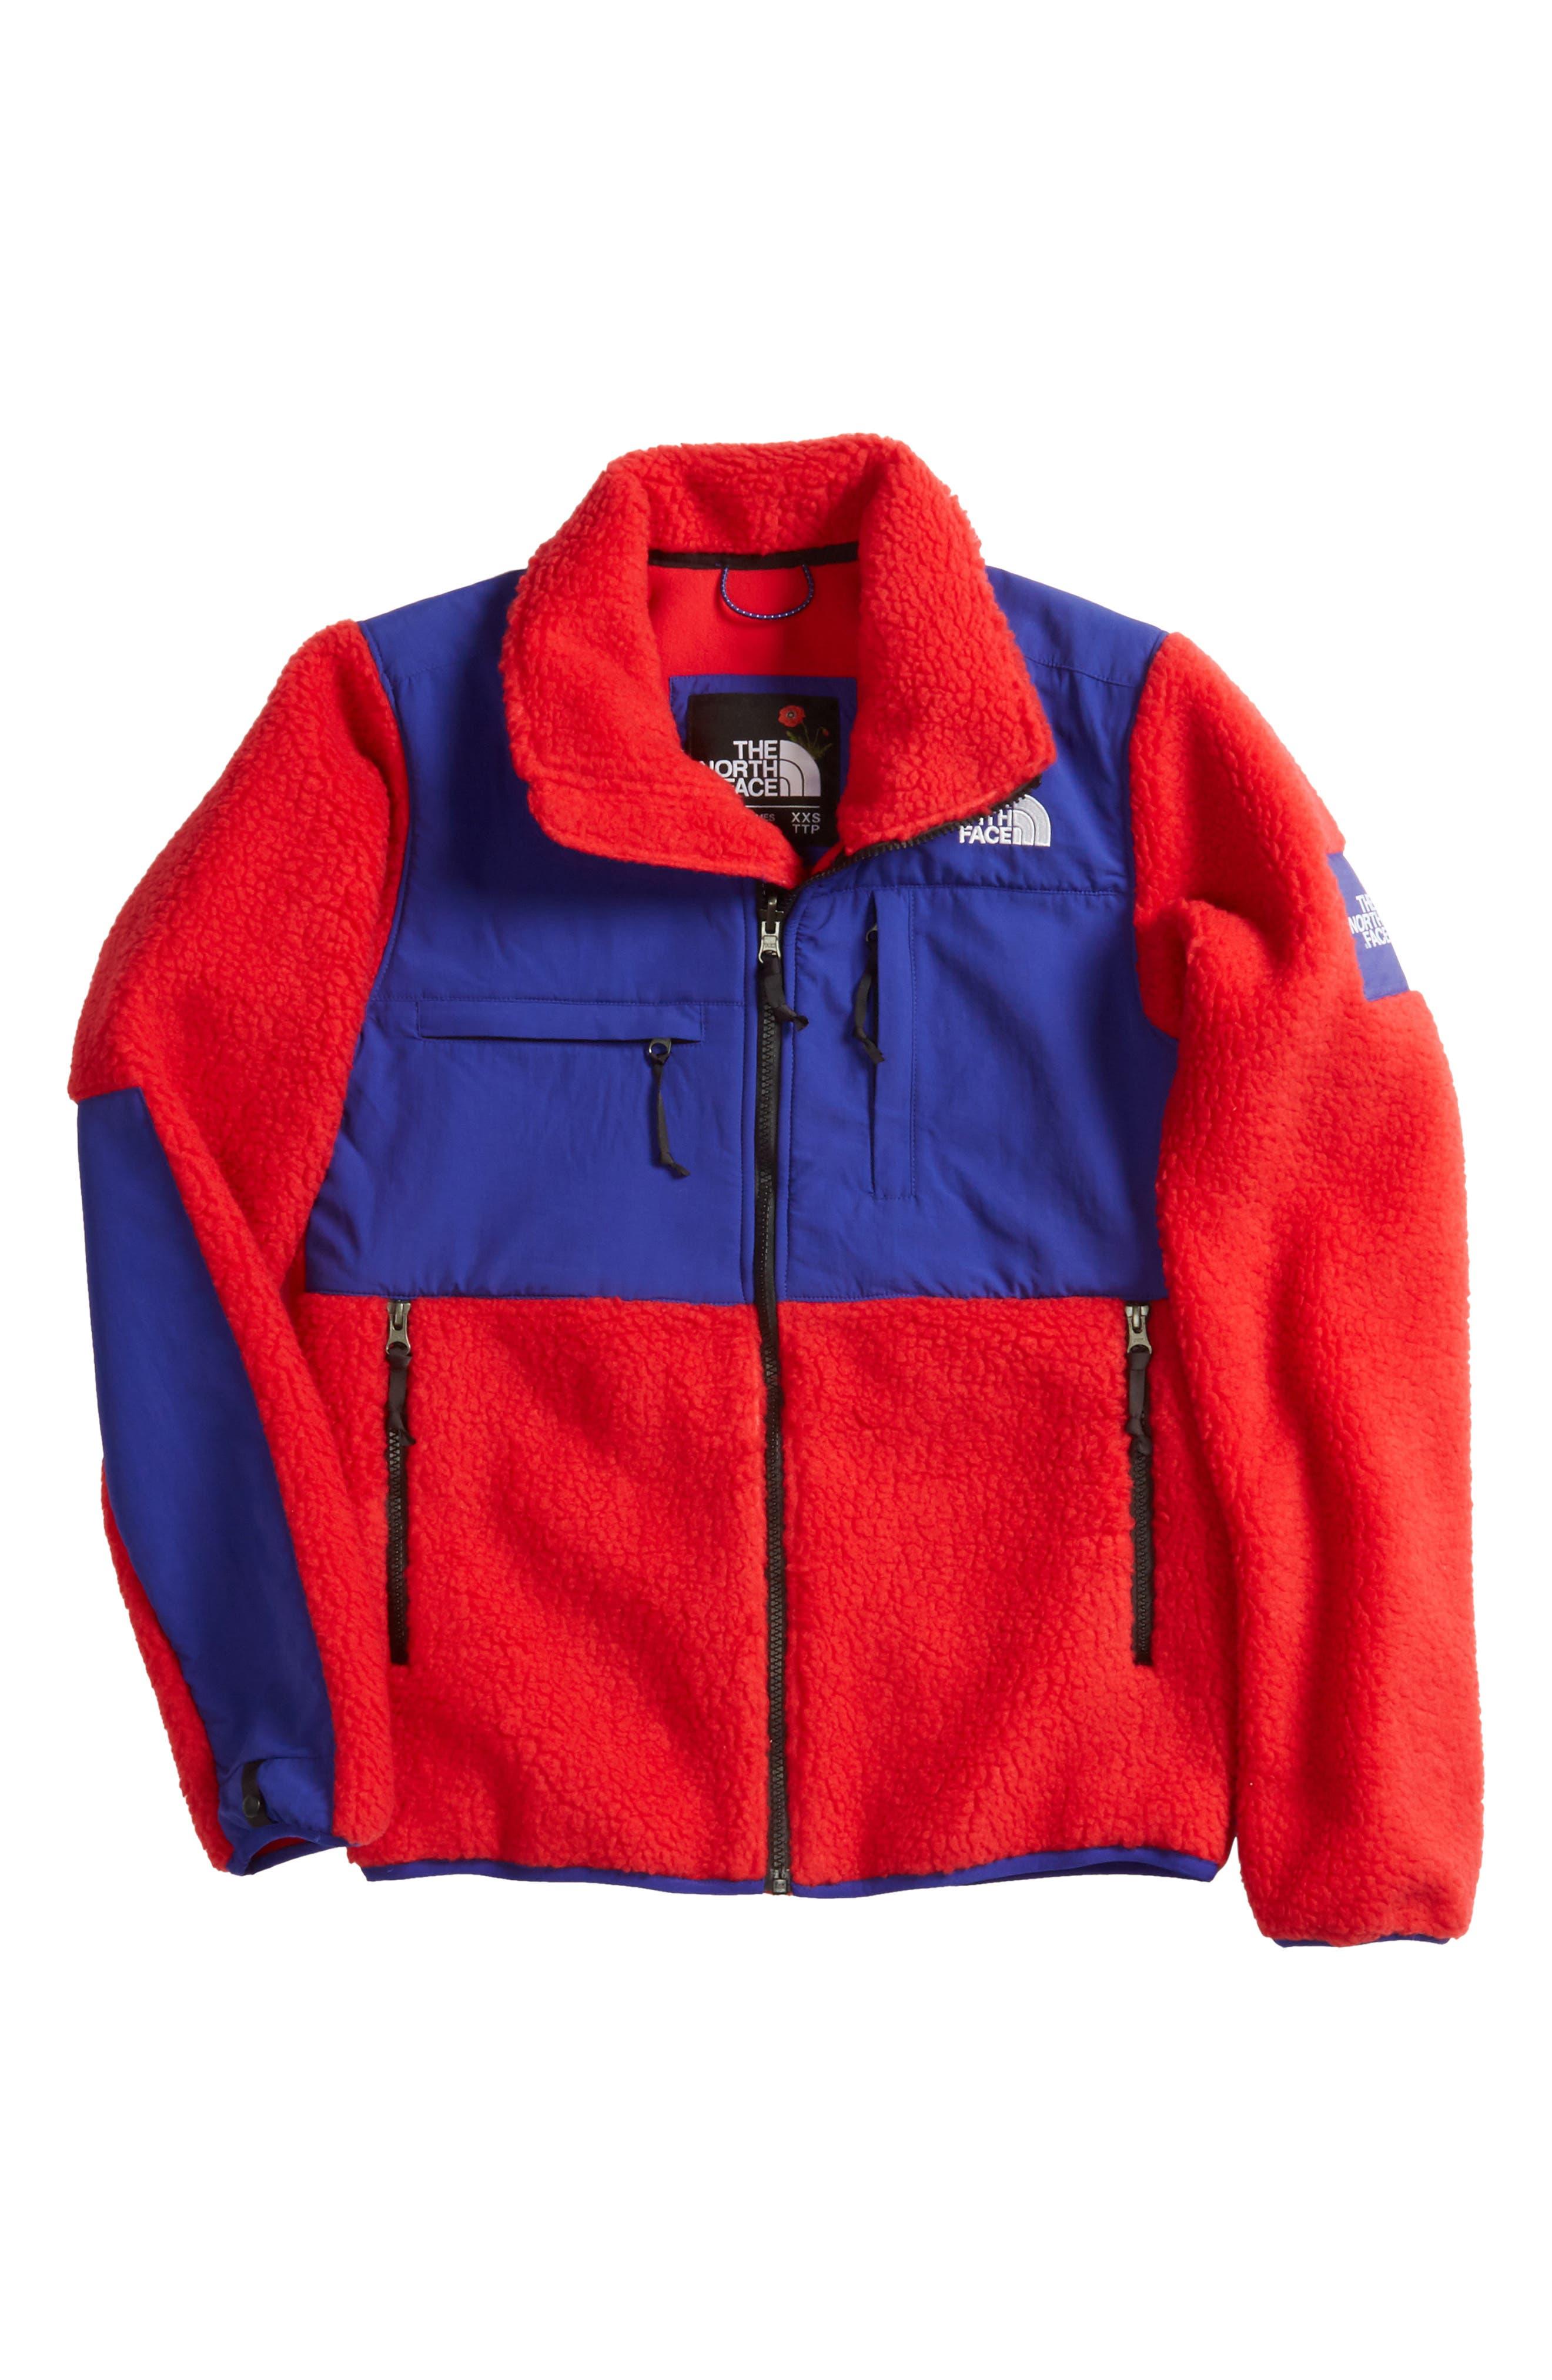 Denali Jacket,                         Main,                         color, Tnf Red